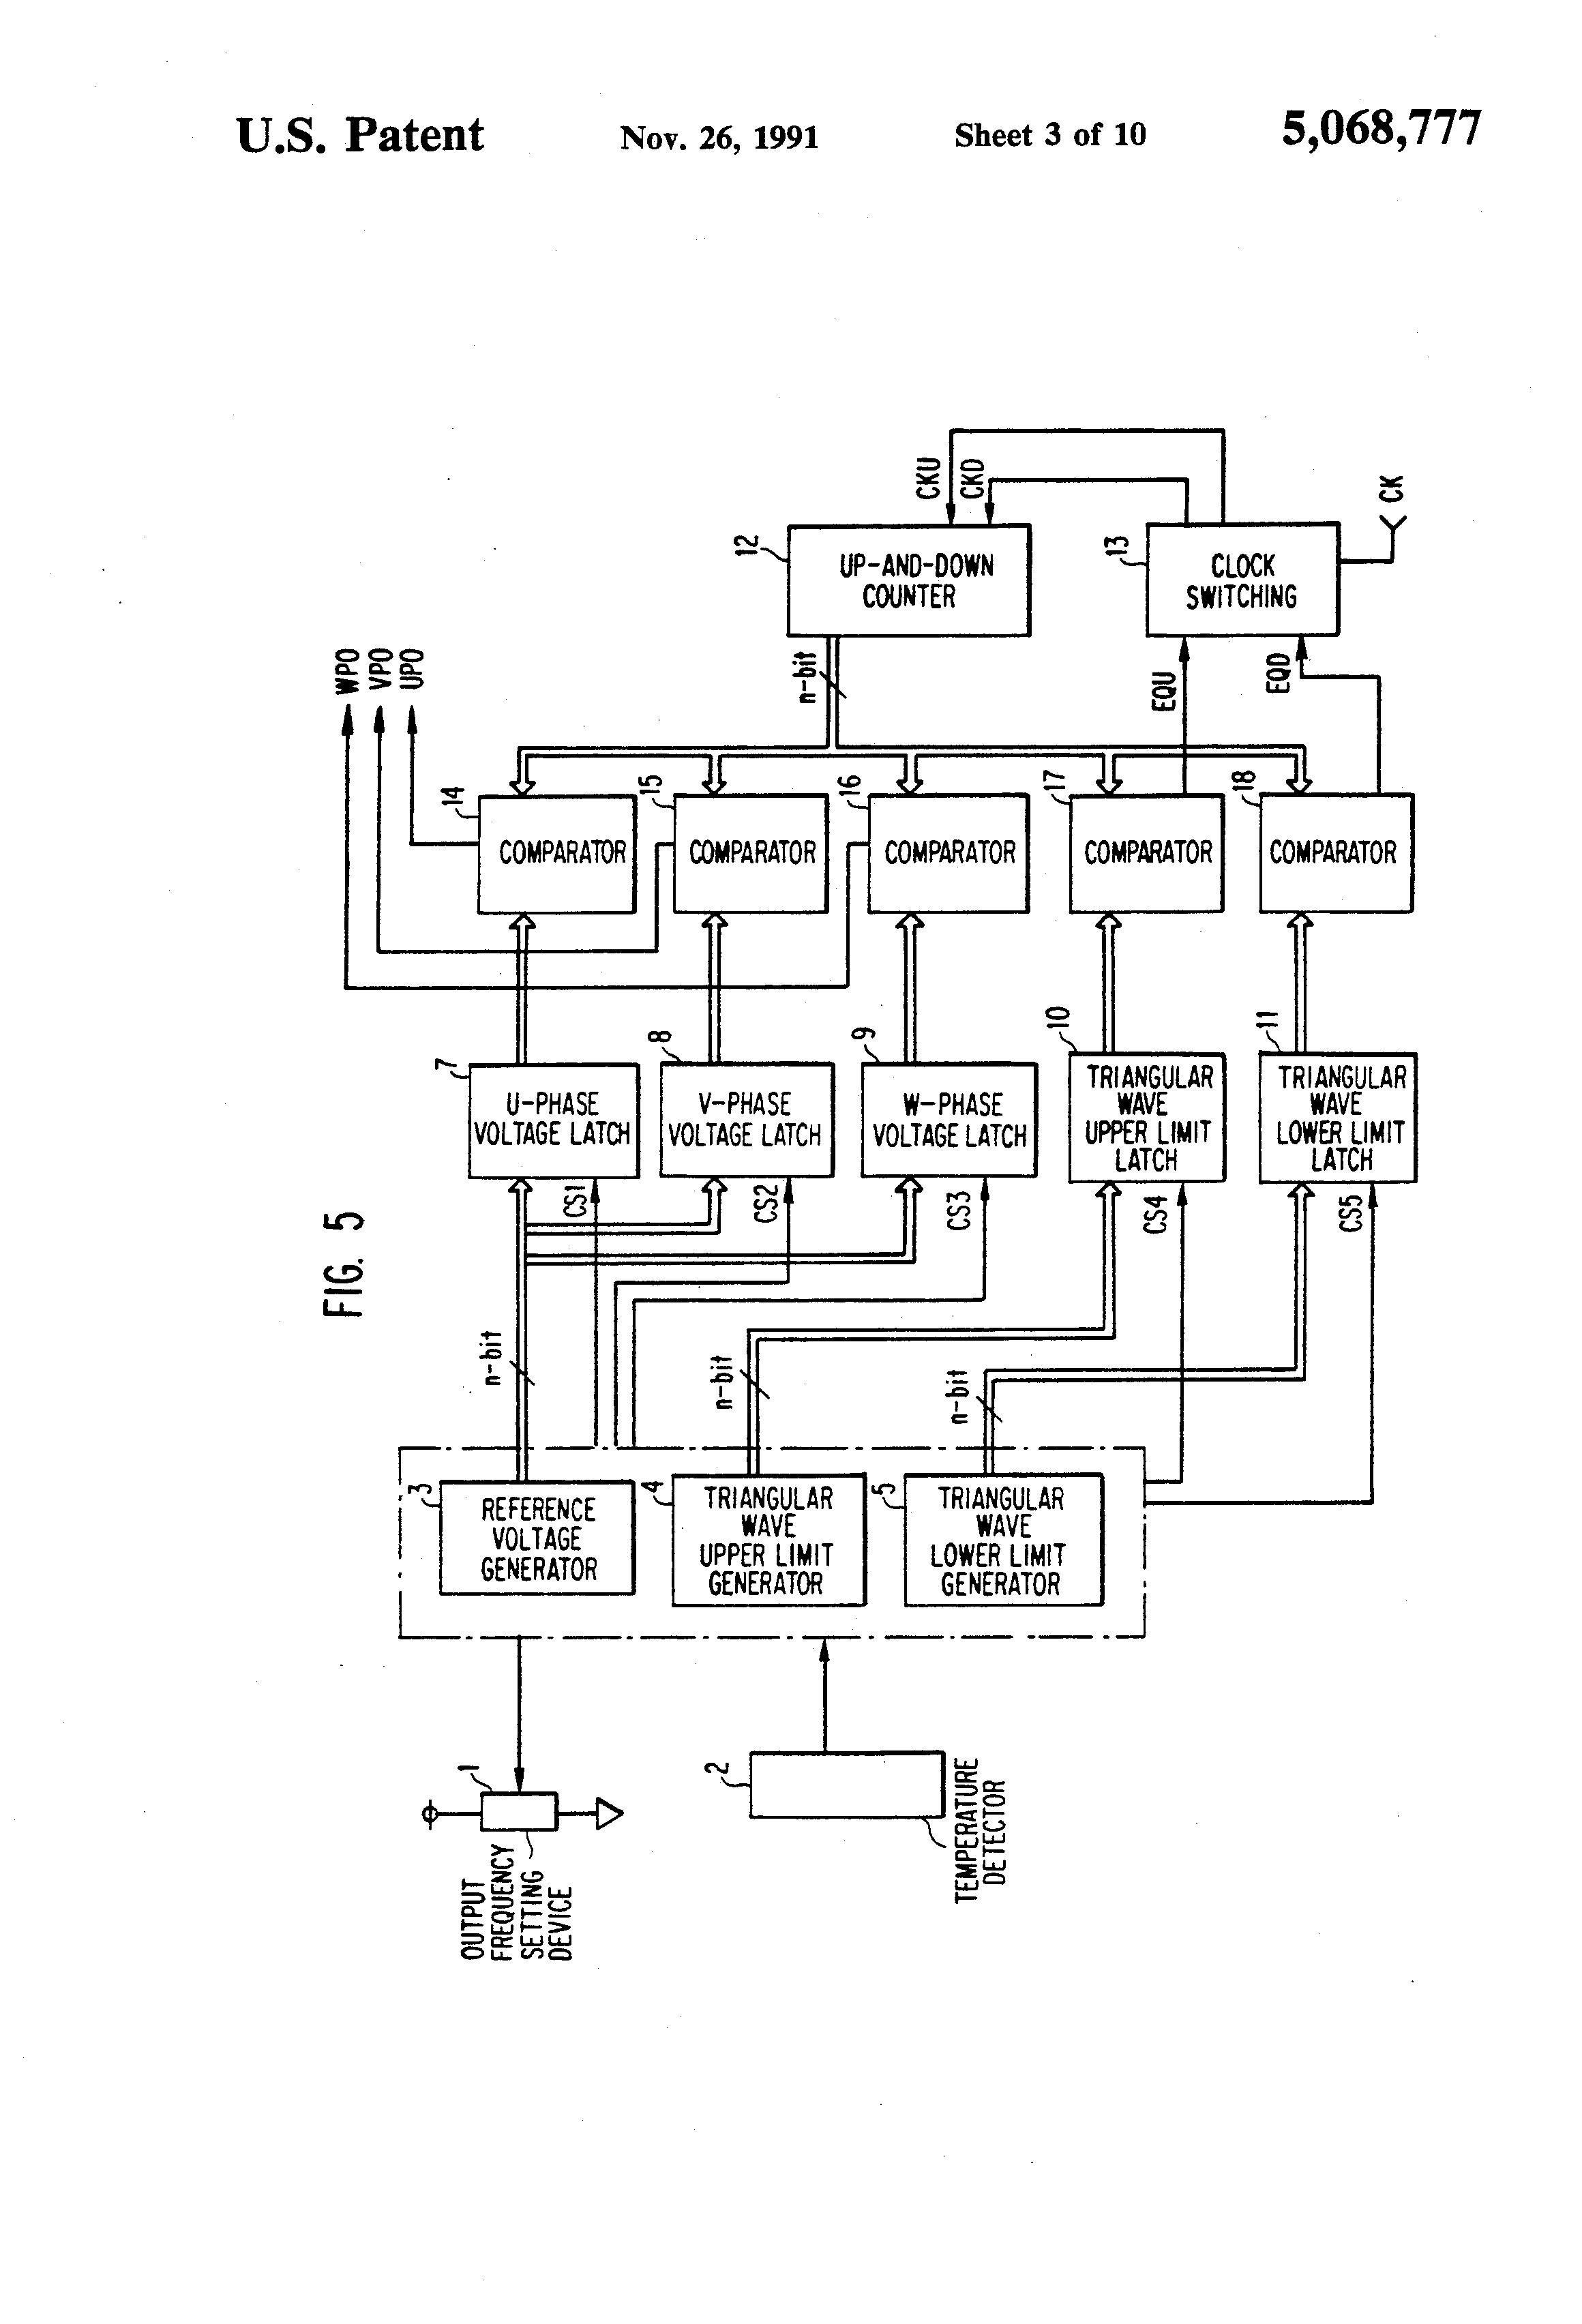 Patent Us5068777 Pulse Width Modulation Type Inverter Having Triangular Wave Generator Drawing